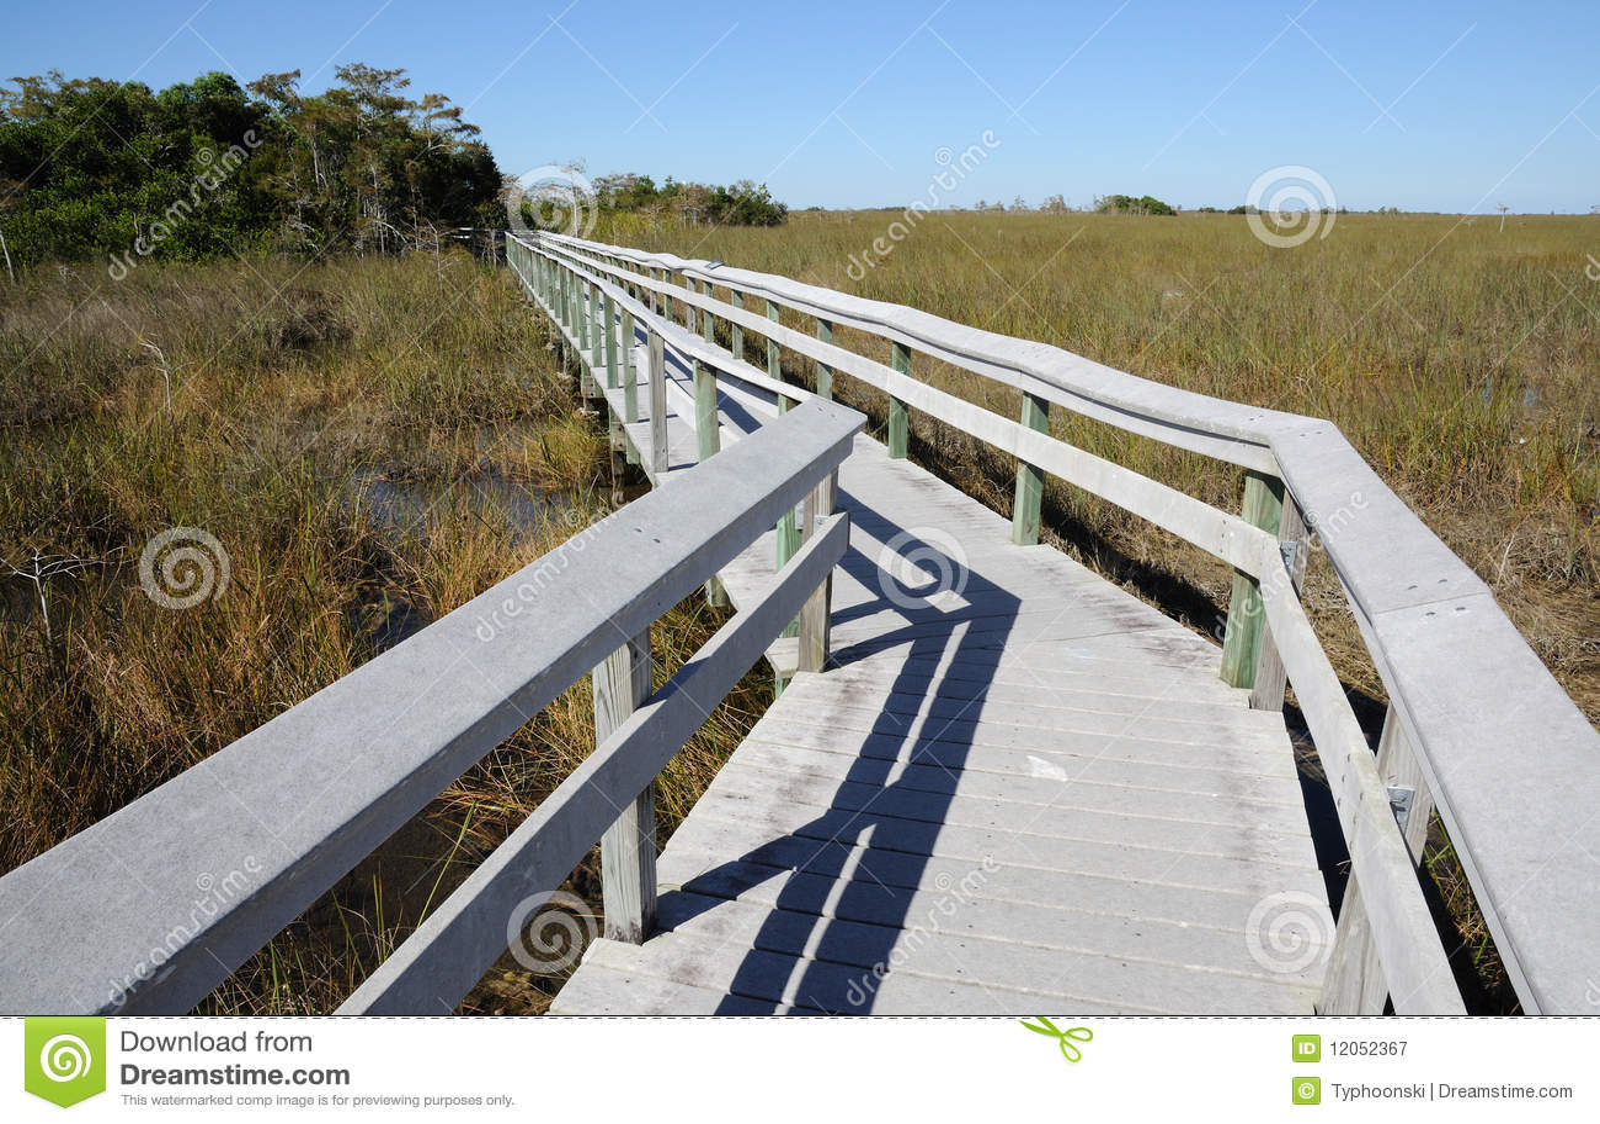 Journal d observation en stationnement national de marais